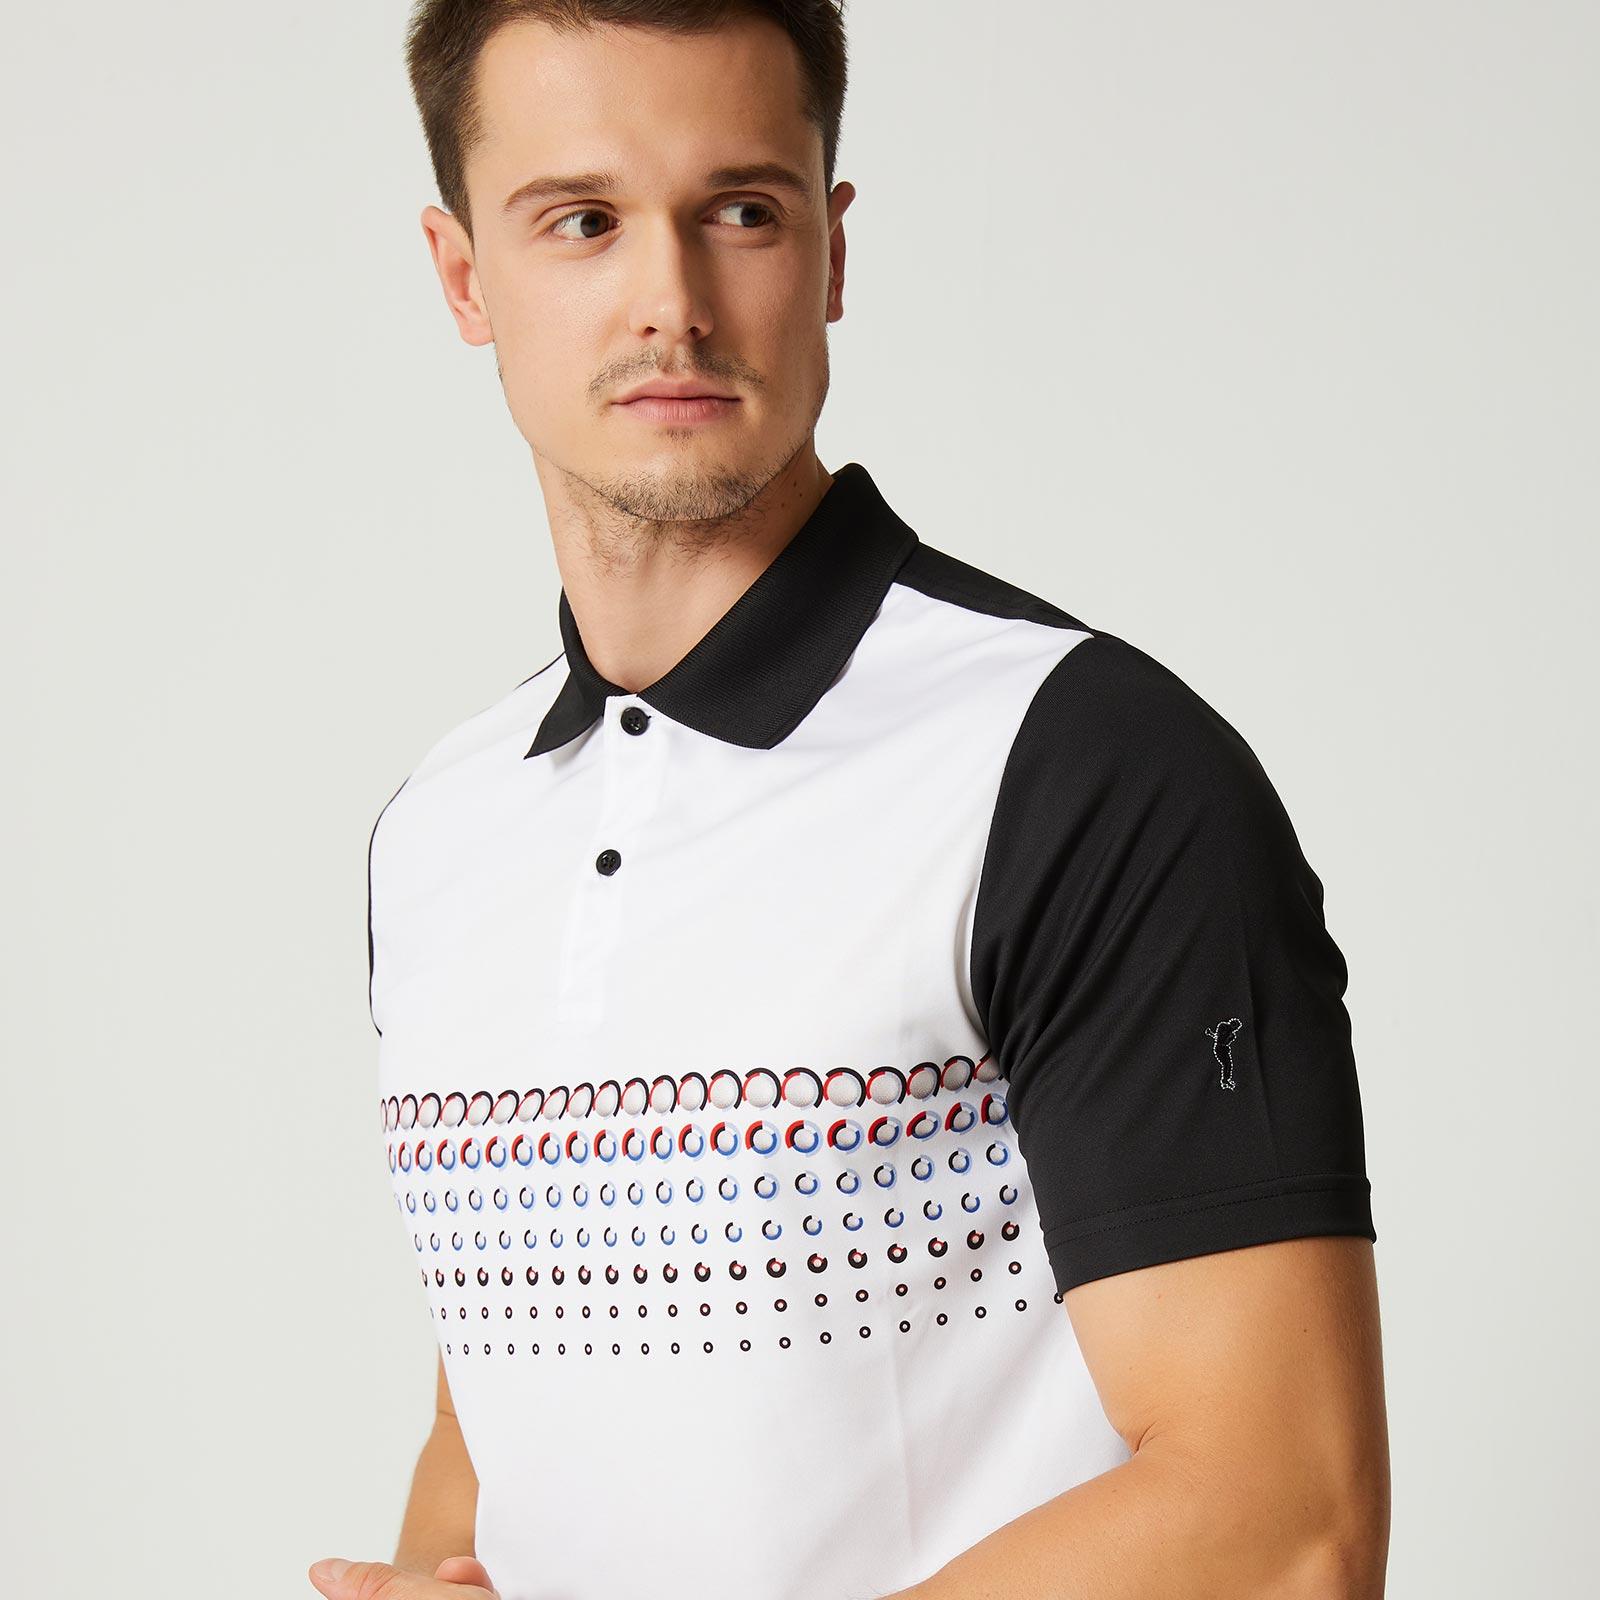 Herren Poloshirt aus Dry Comfort Jersey